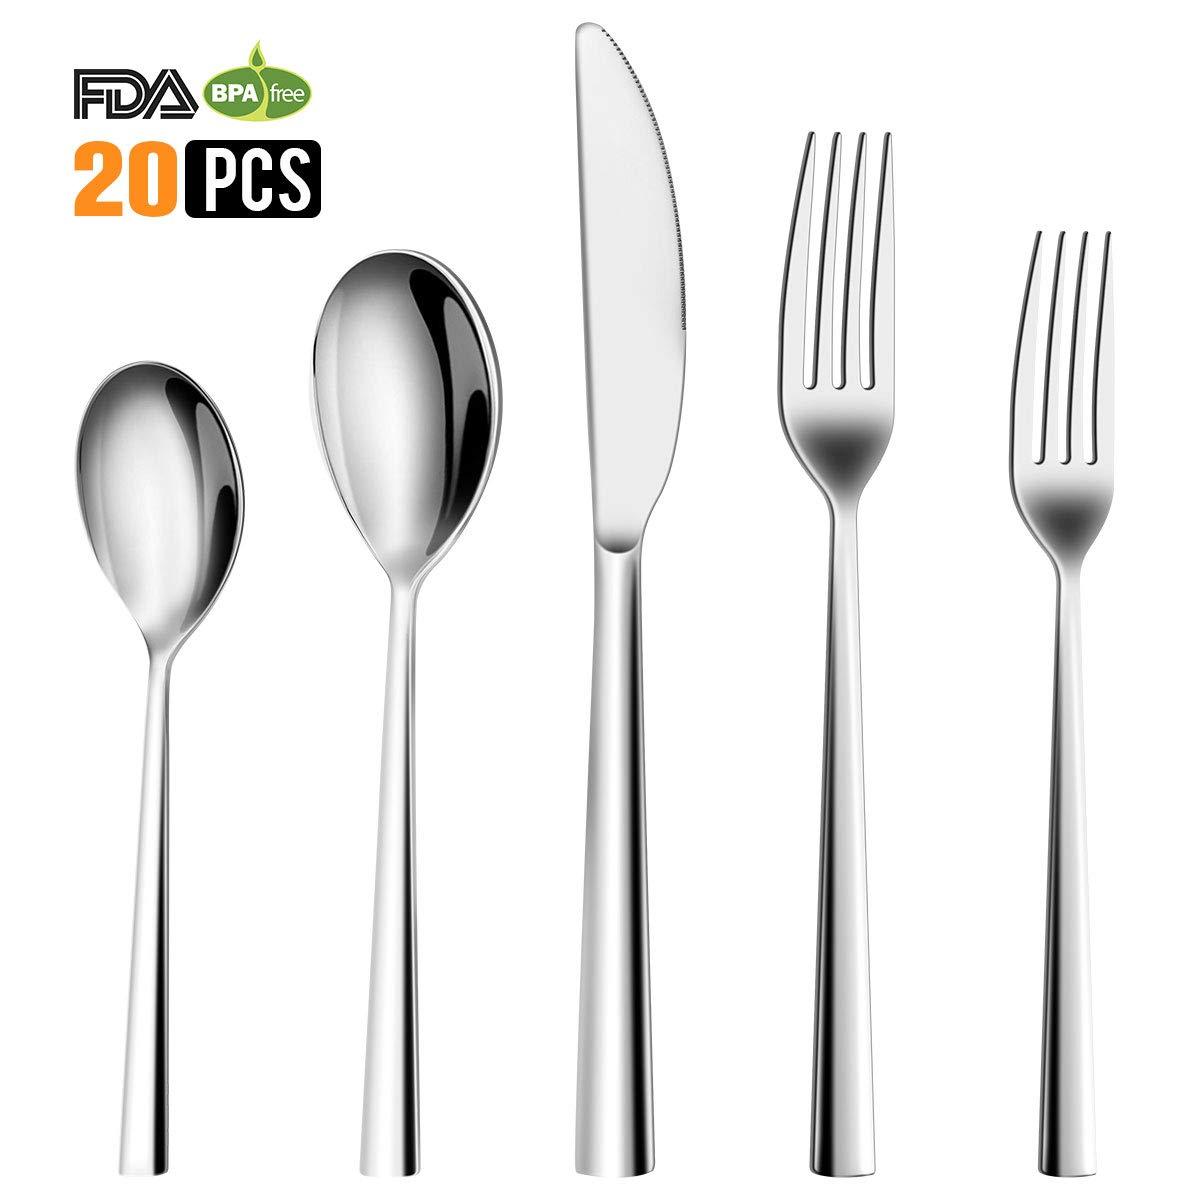 Silverware Set, 20 Piece Flatware Set 18/10 Stainless Steel Mirror Polished Cutlery Set, Forks Spoons Knives Set for Home Kitchen Restaurant Tableware Utensils Service for 4, Dishwasher Safe